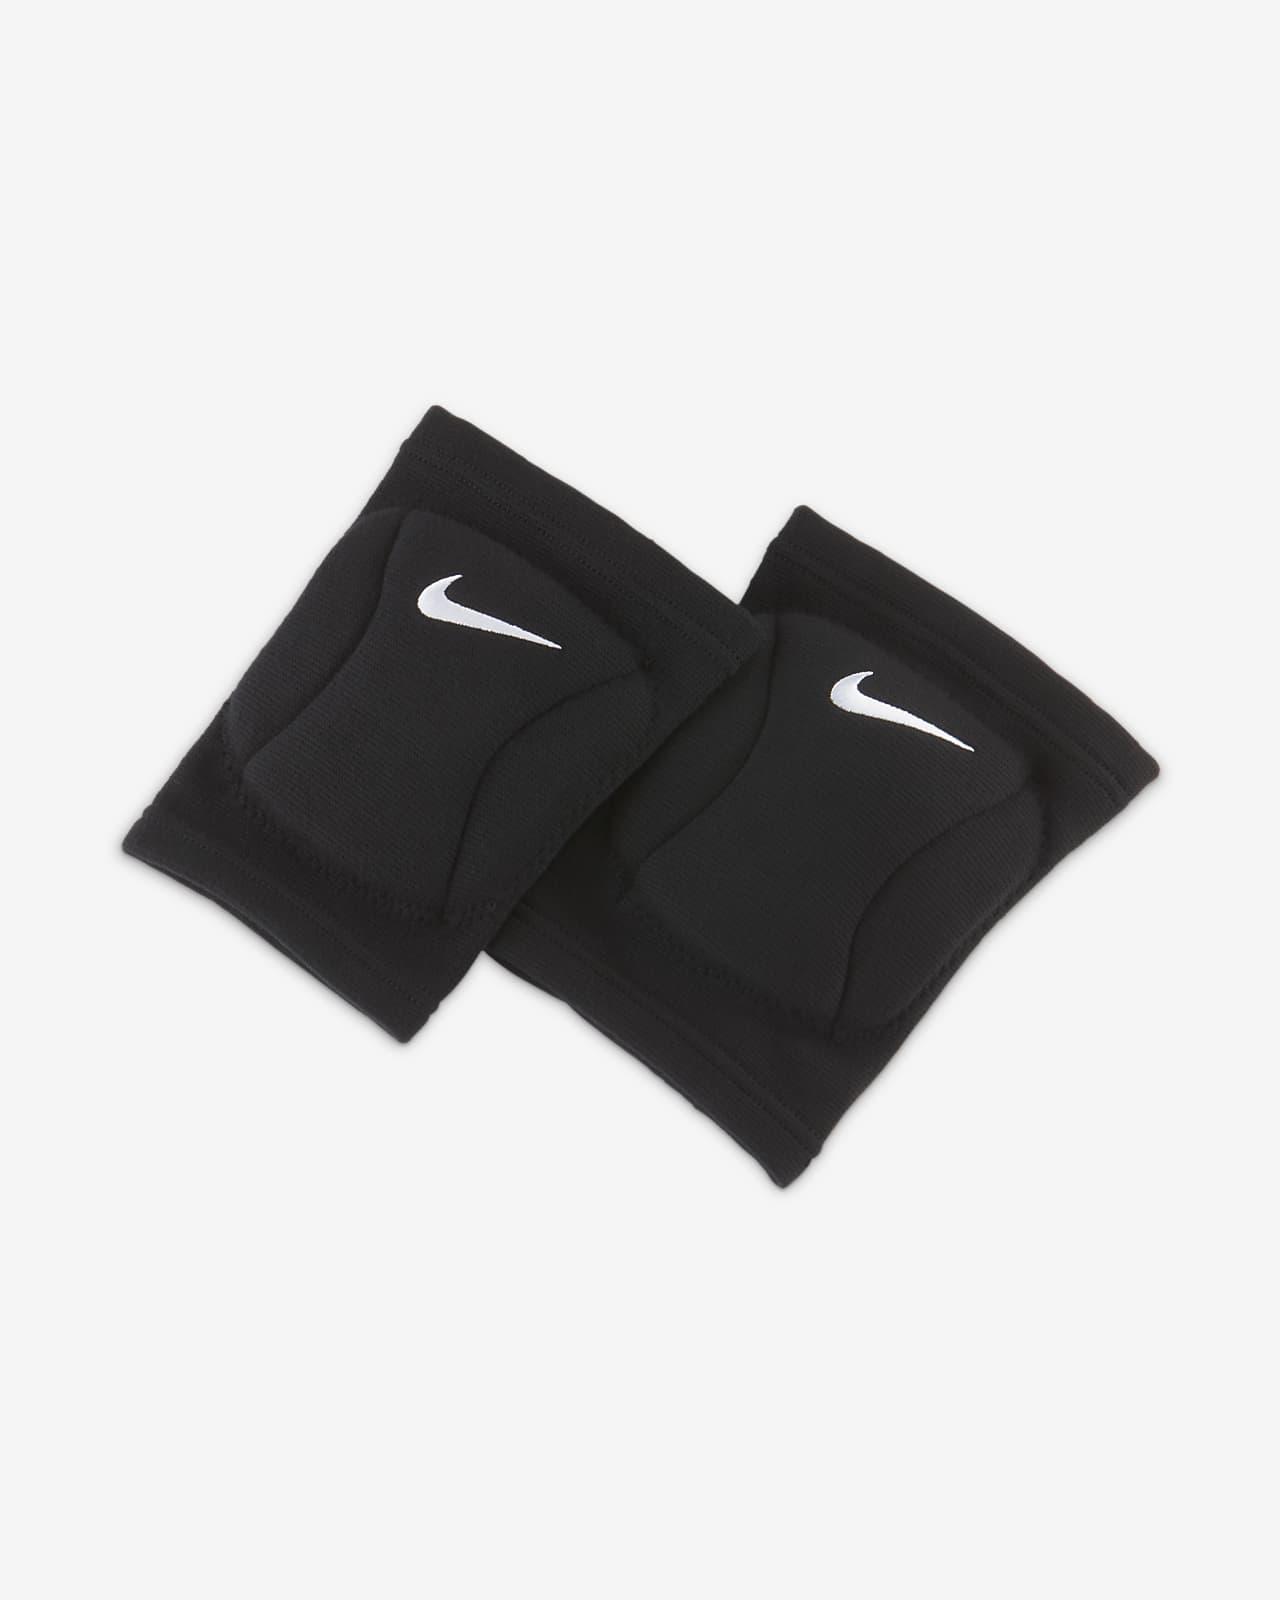 Genouillères de volley-ball Nike Streak